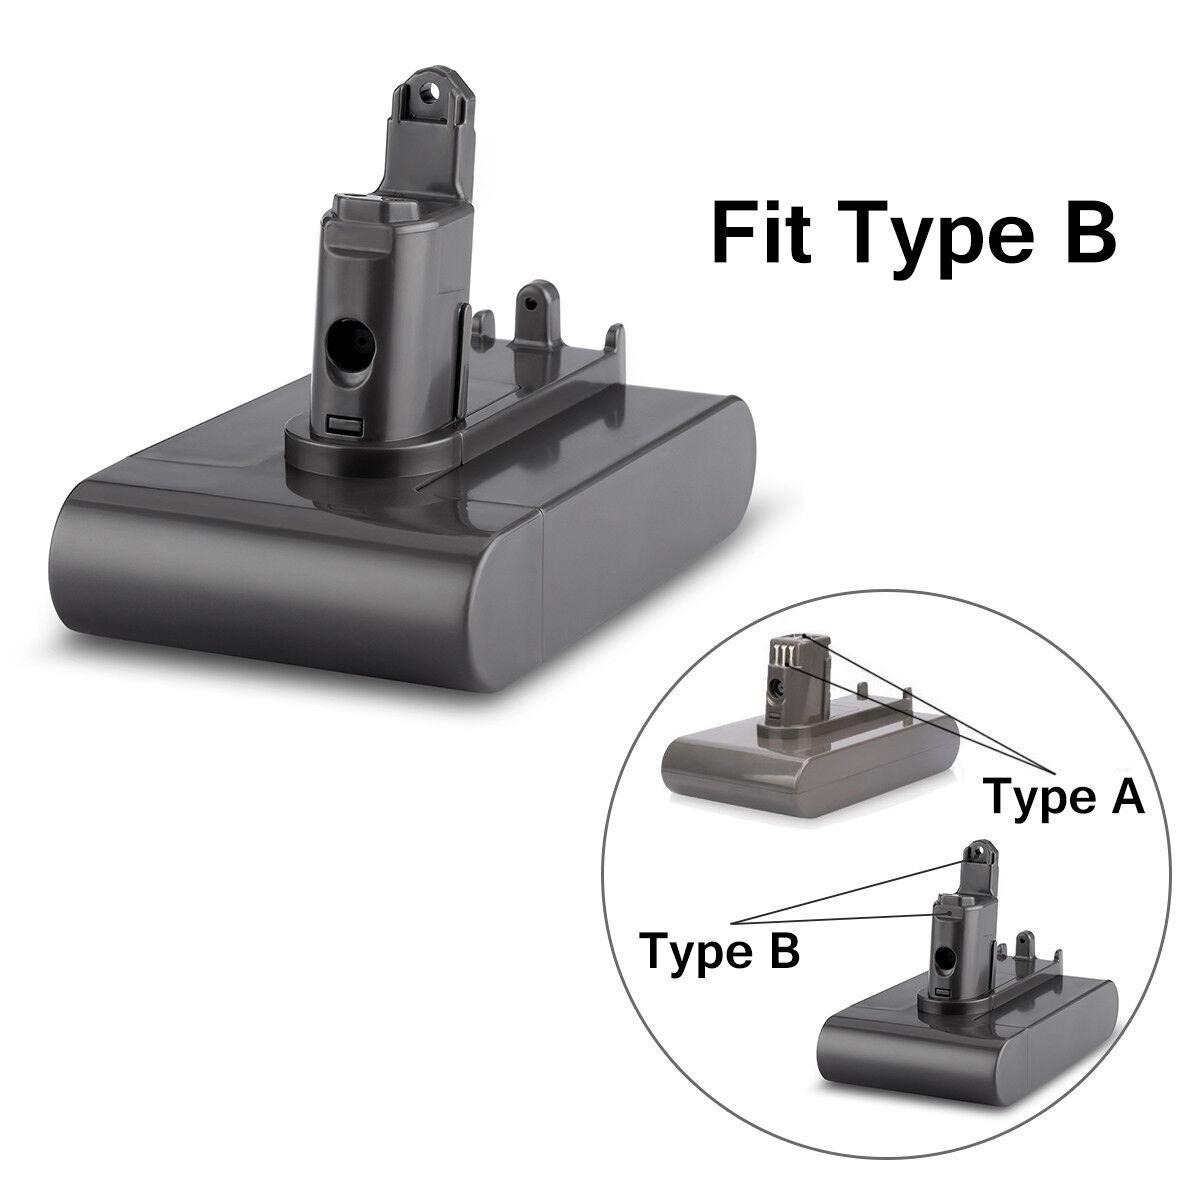 22.2V 3000mAh Type B Vacuum Cleaner Battery For Dyson DC31 DC44 Animal DC45 DC34 2